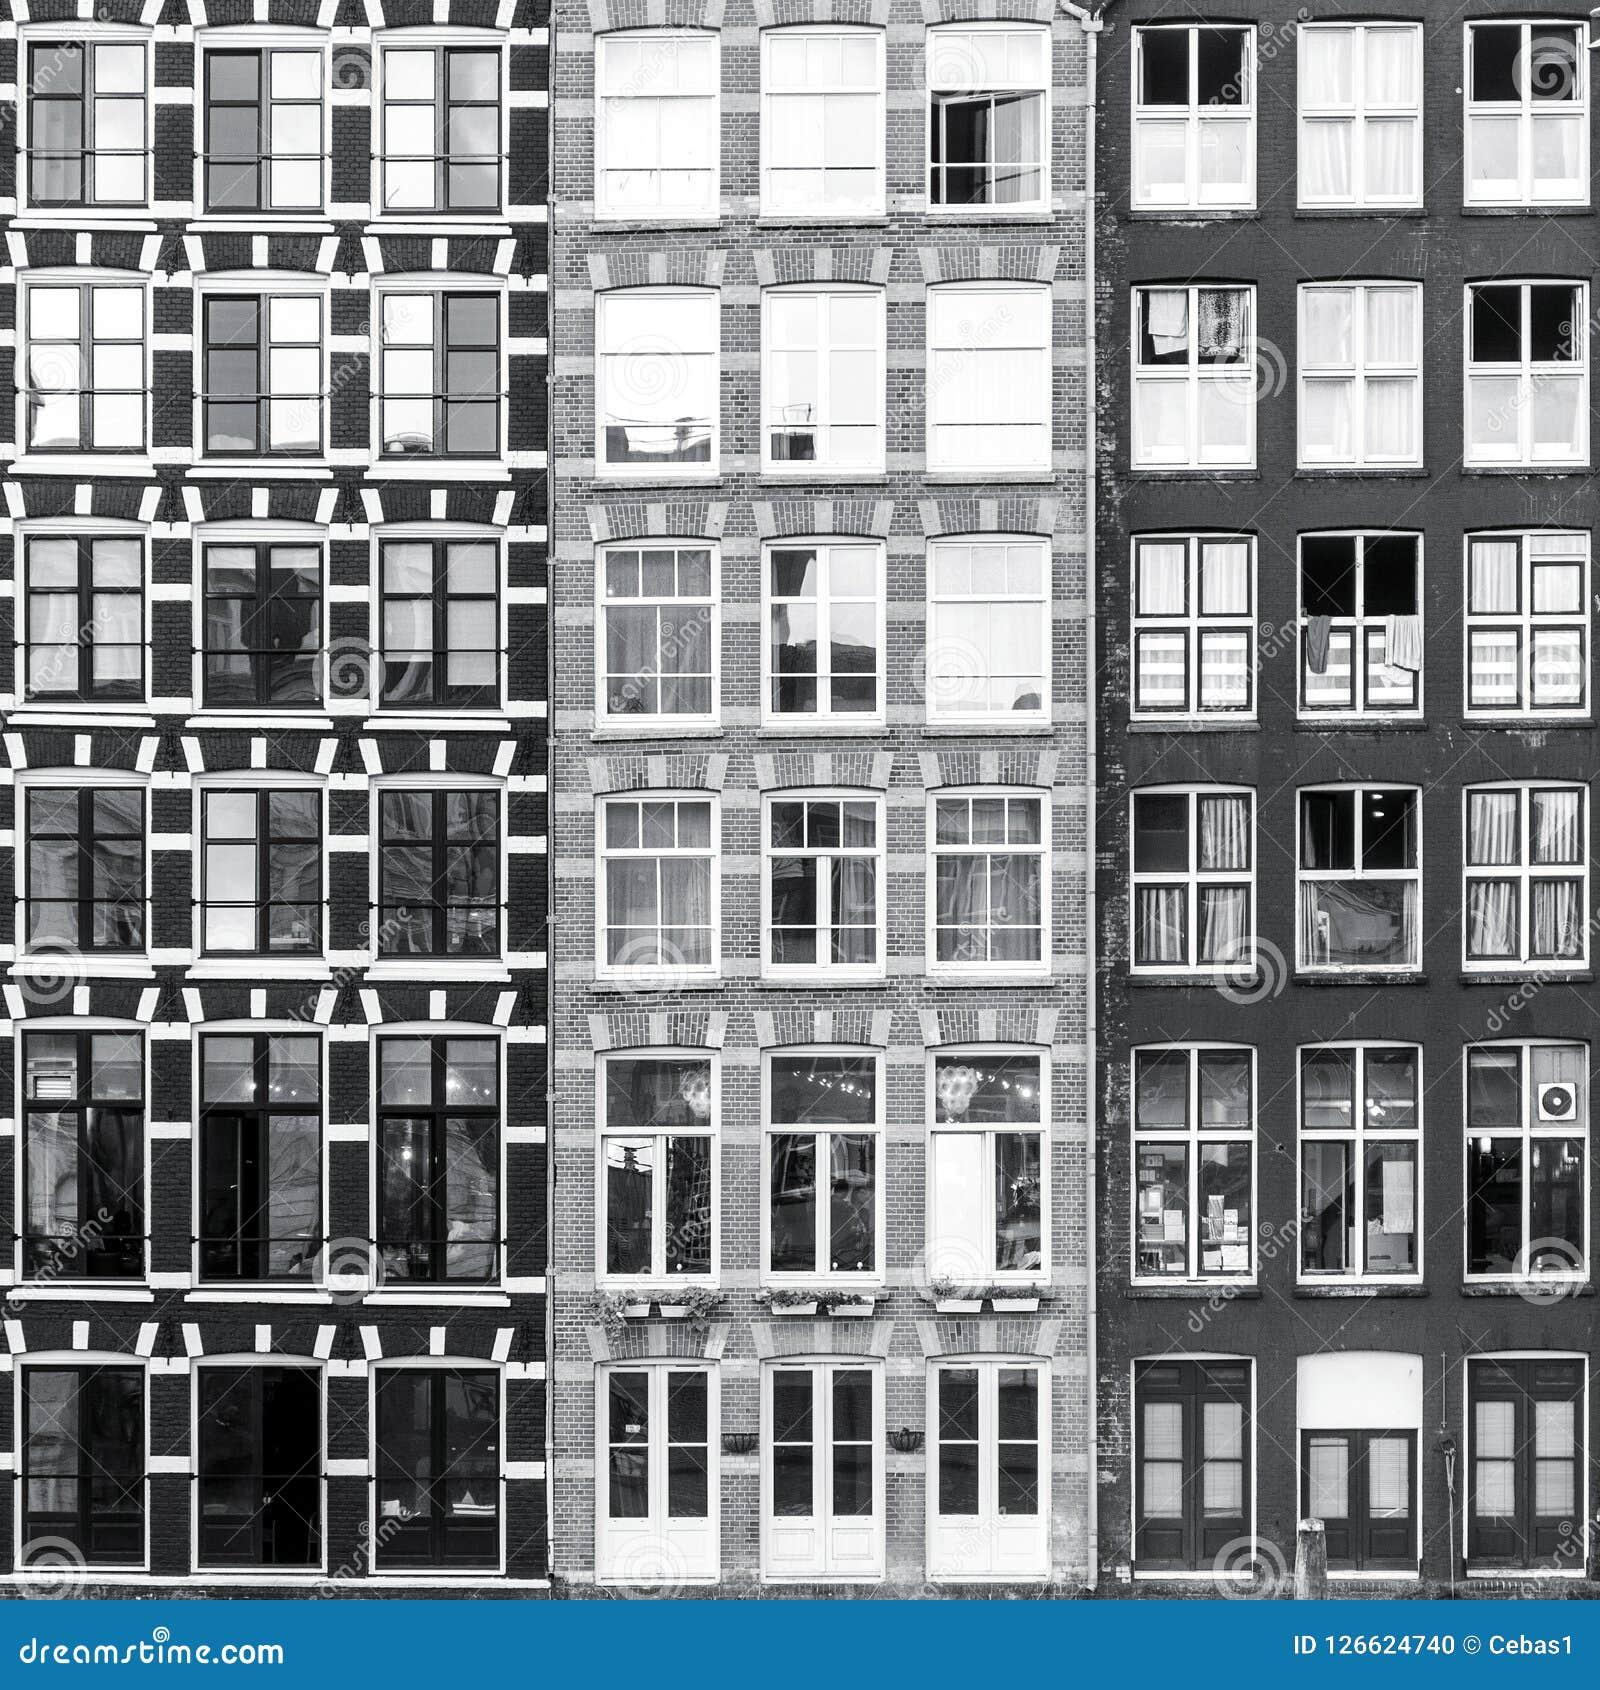 Black and white Amsterdam windows background